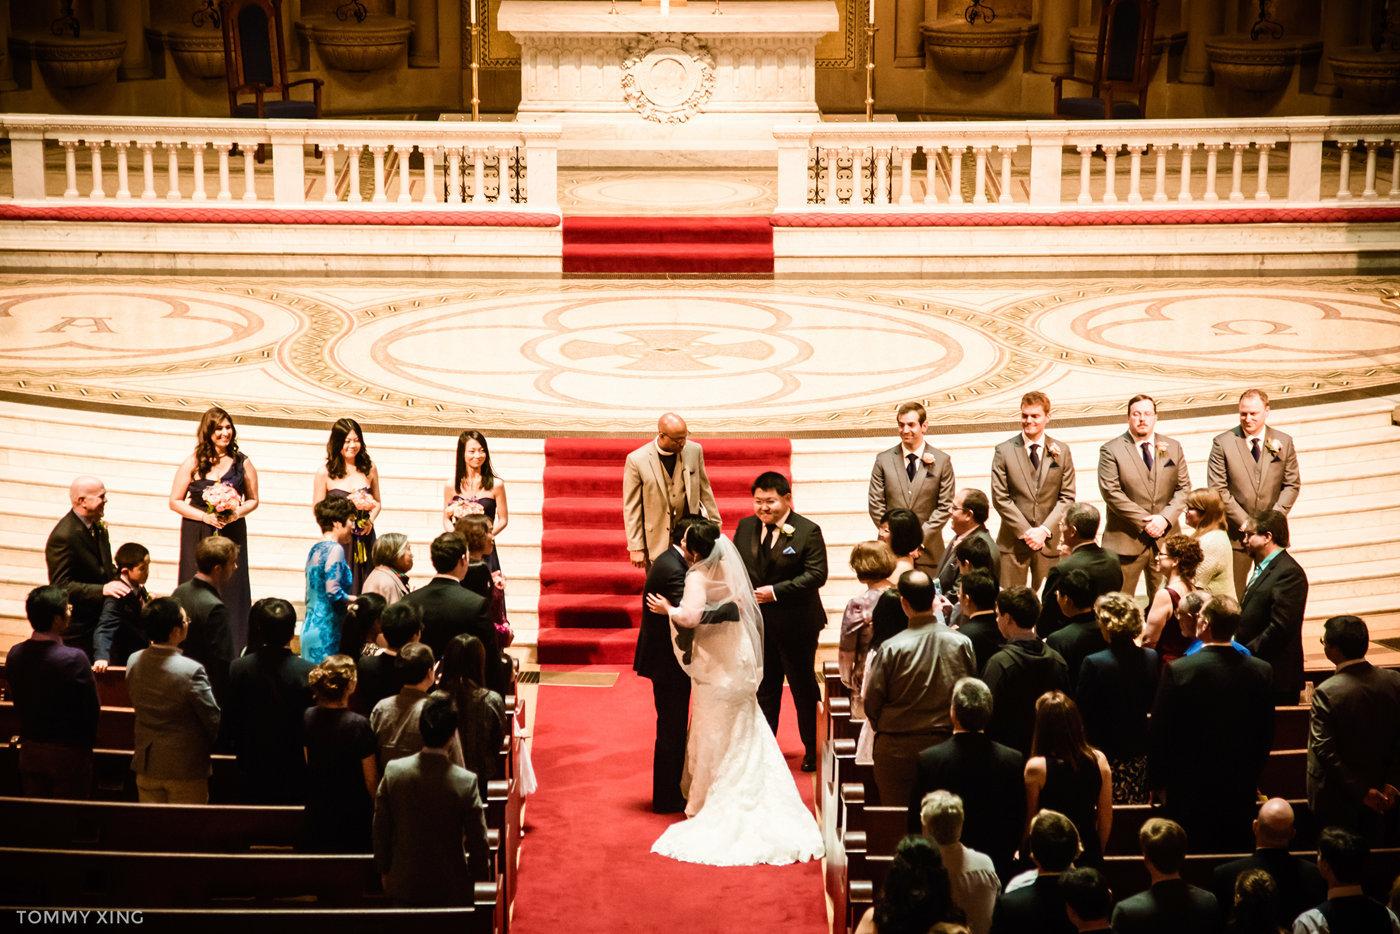 STANFORD MEMORIAL CHURCH WEDDING - Wenjie & Chengcheng - SAN FRANCISCO BAY AREA 斯坦福教堂婚礼跟拍 - 洛杉矶婚礼婚纱照摄影师 Tommy Xing Photography082.jpg